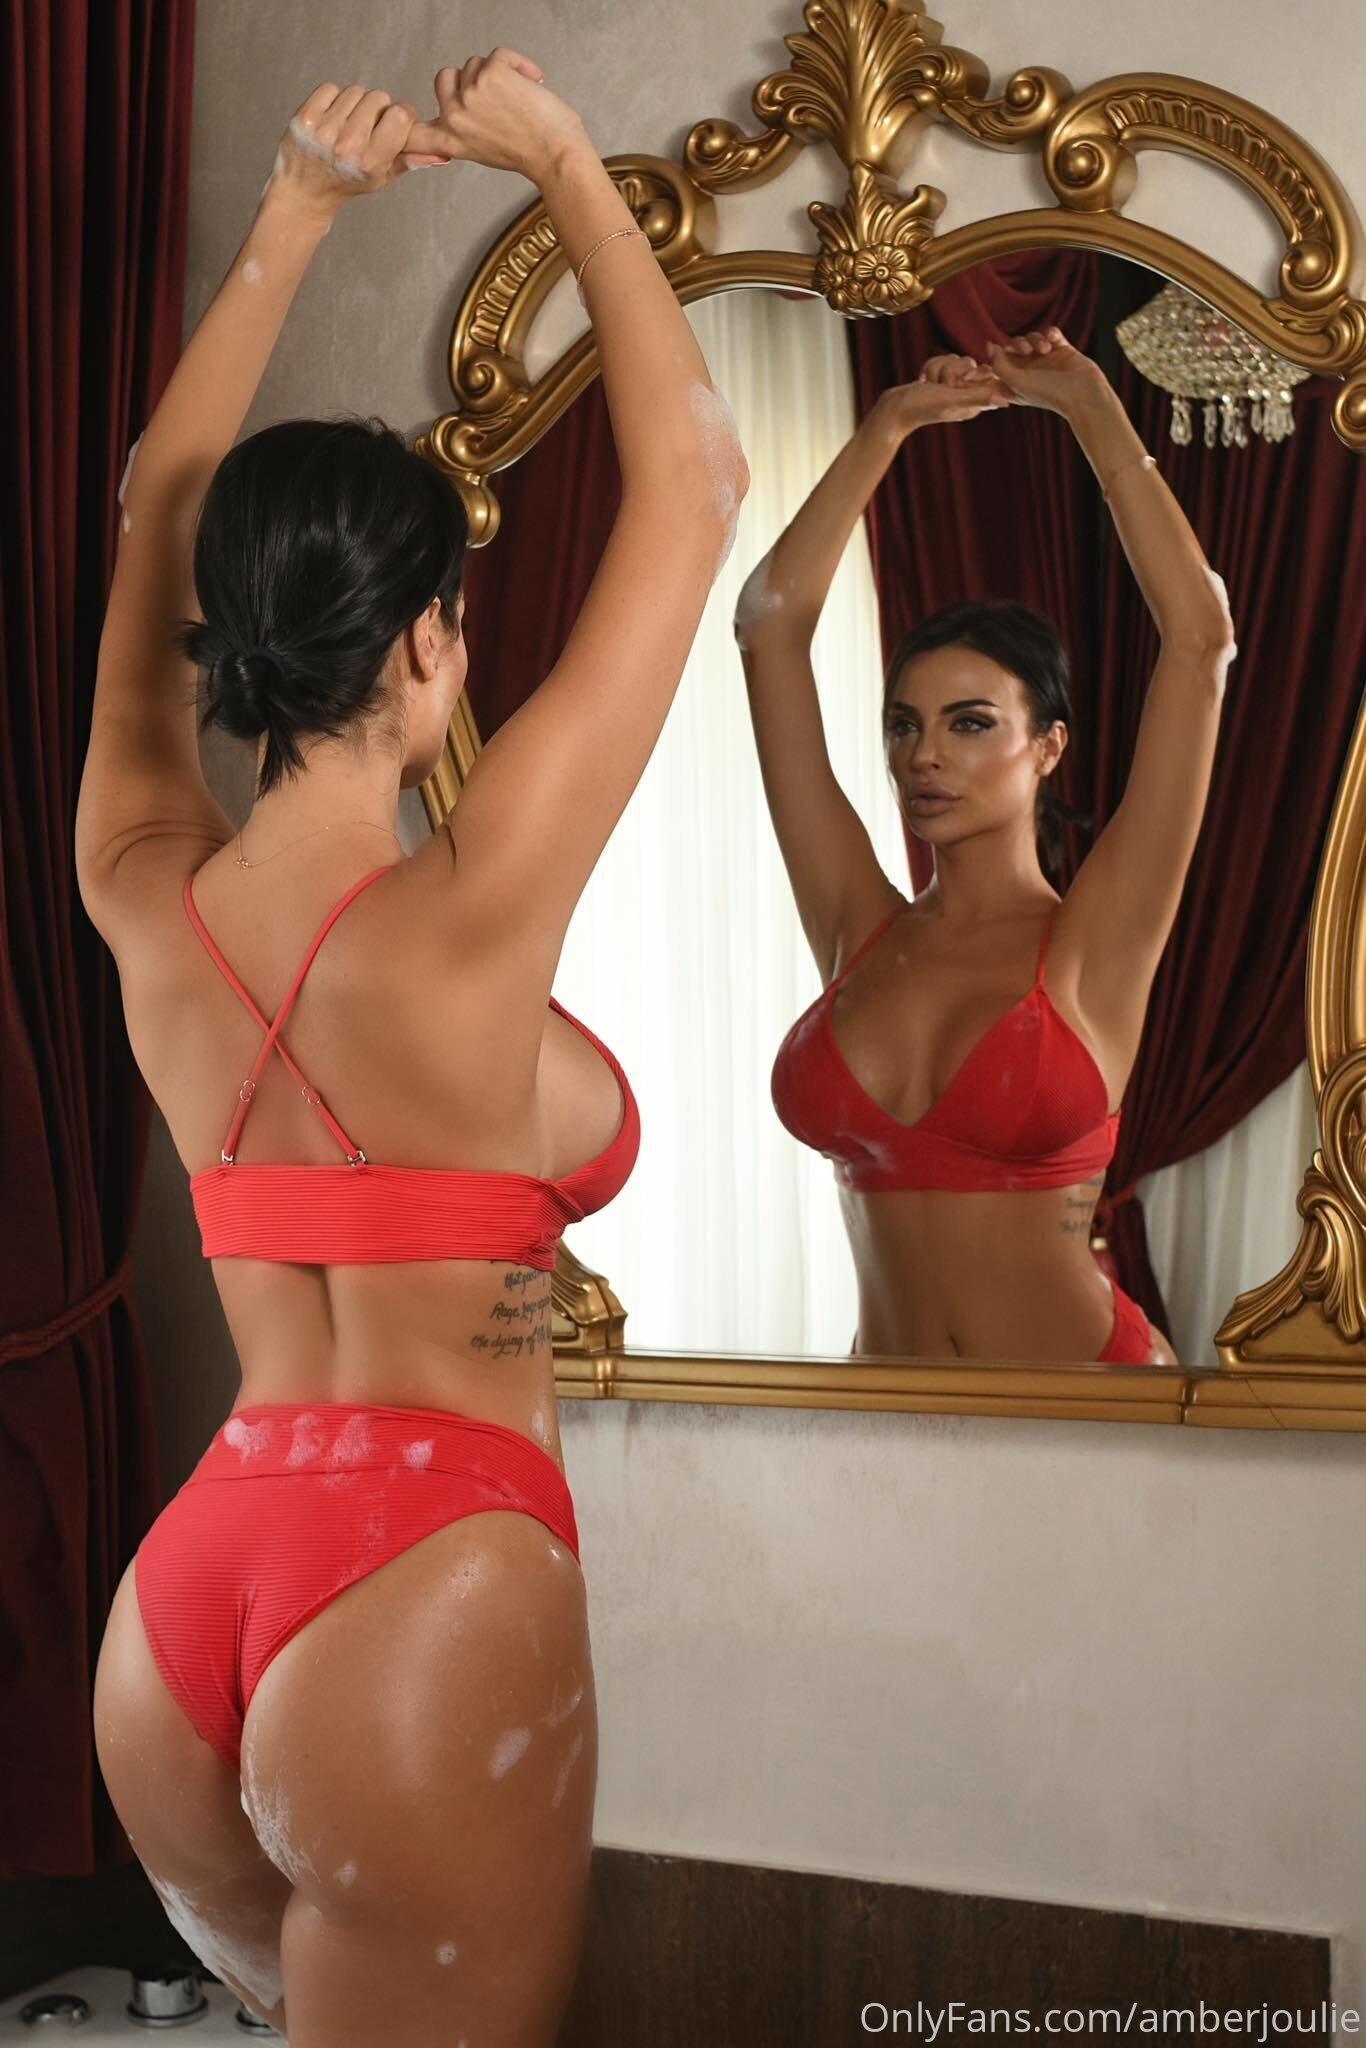 @amberjoulie nude photo 36